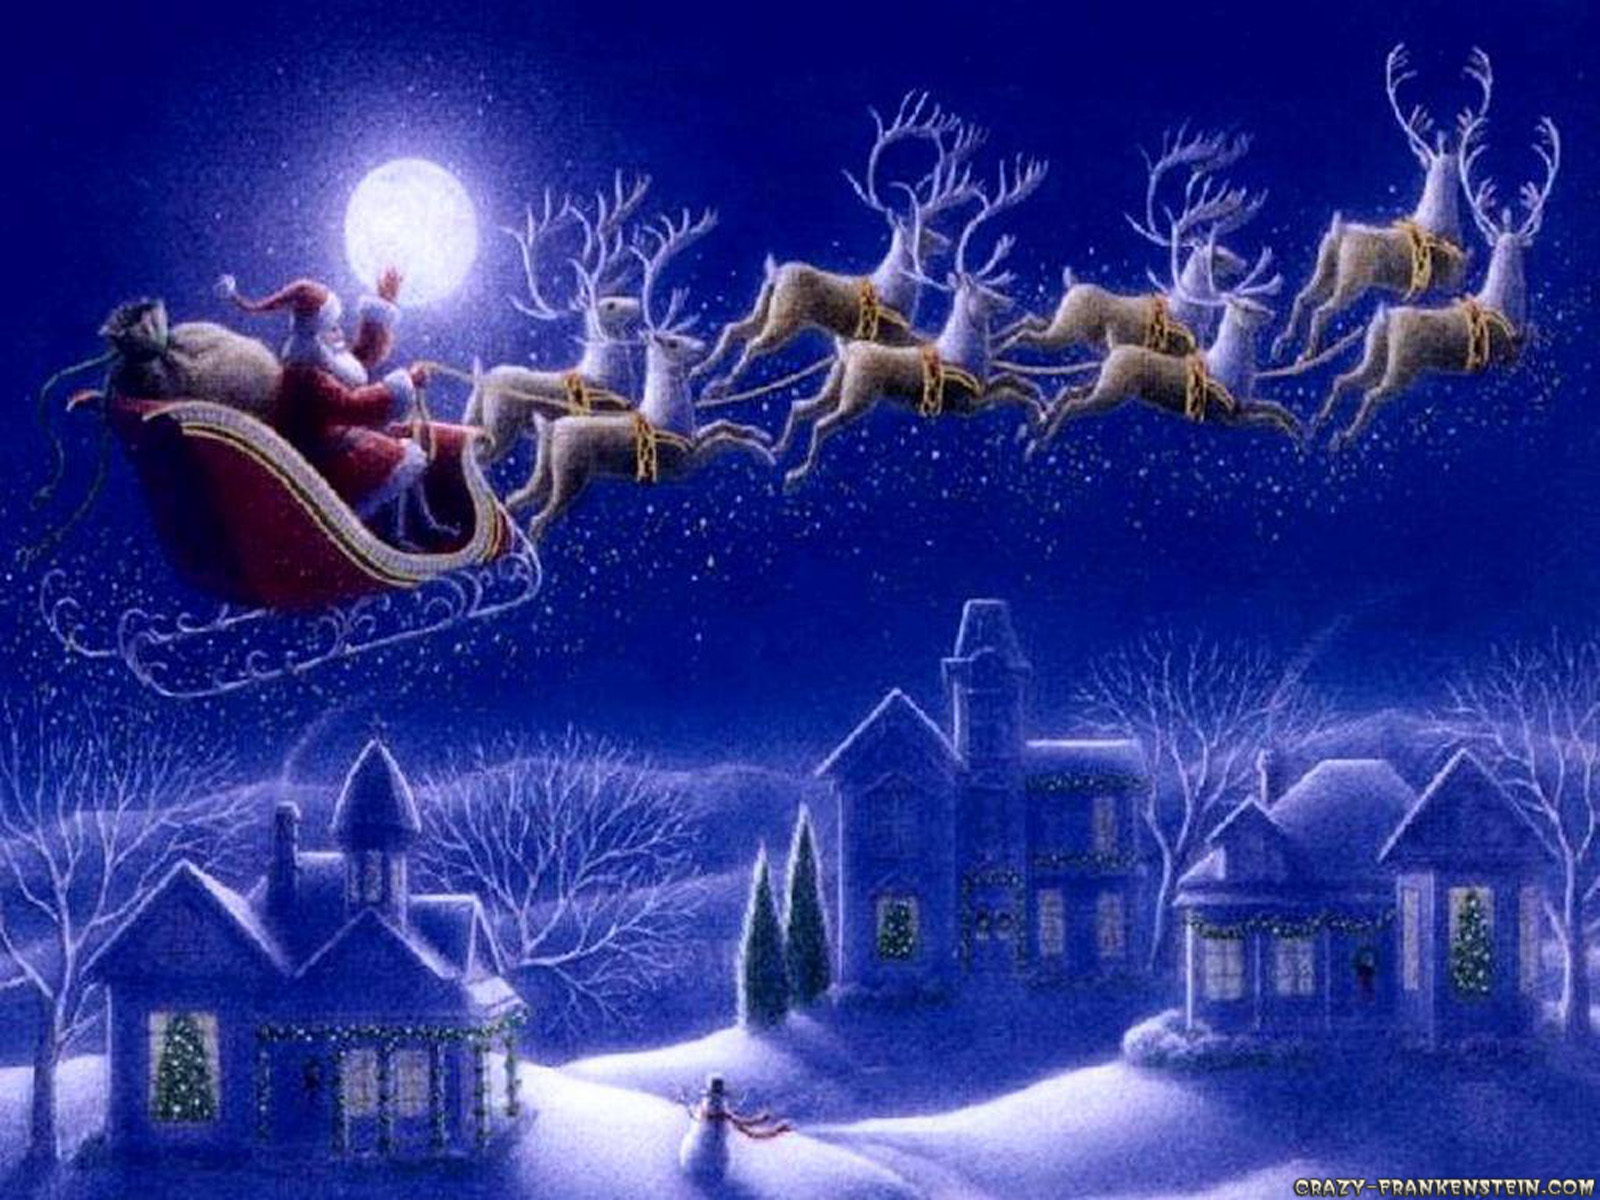 http://1.bp.blogspot.com/-rMawxnkLczU/ULbUqNYF2sI/AAAAAAAAAig/RtHbuI_gMEQ/s1600/merry-christmas-wallpapers%2Bhd.jpg